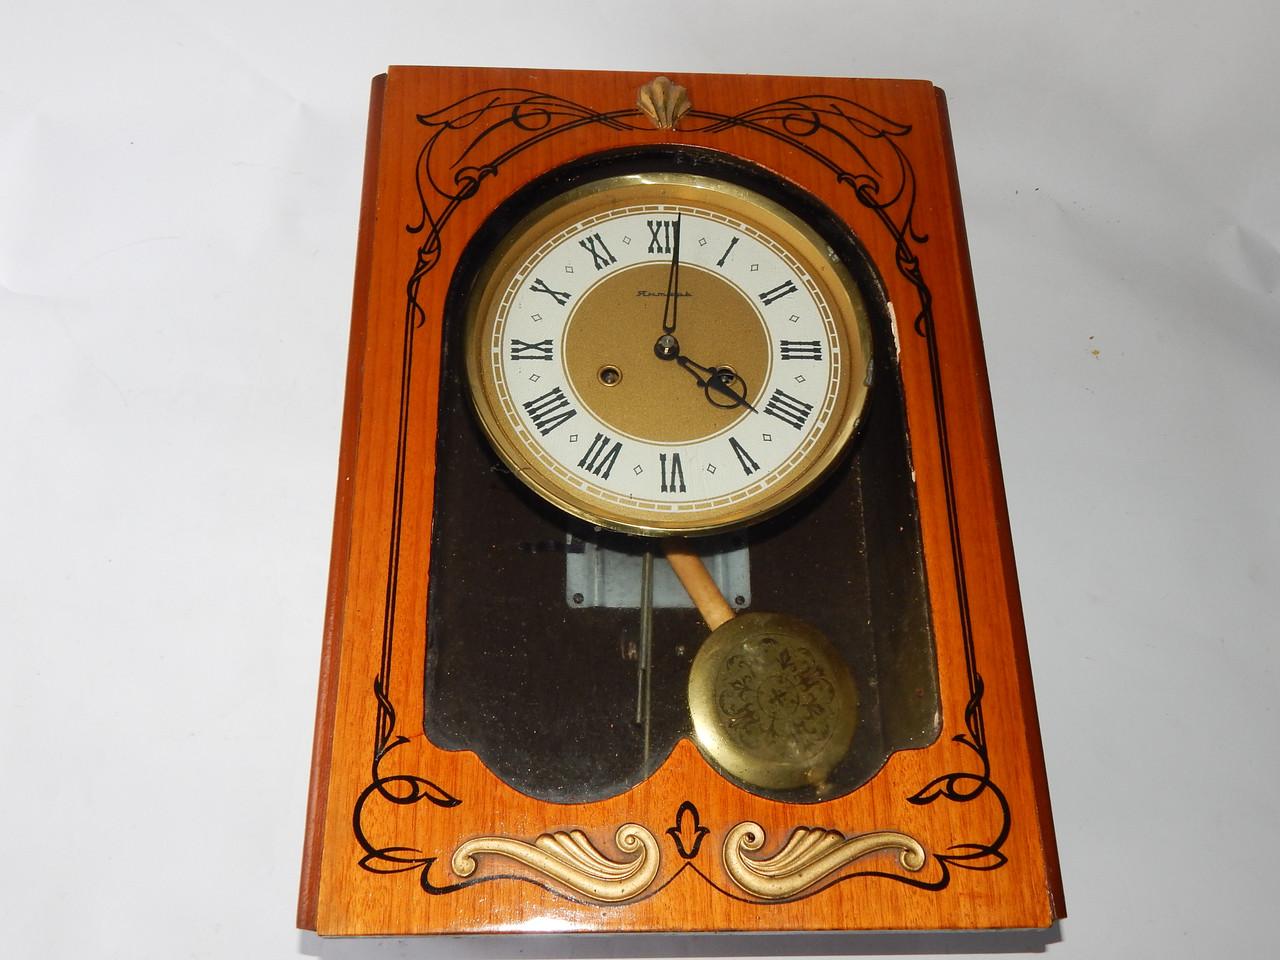 С боем продам янтарь часы настенные октябрьском ломбарда часы работы на